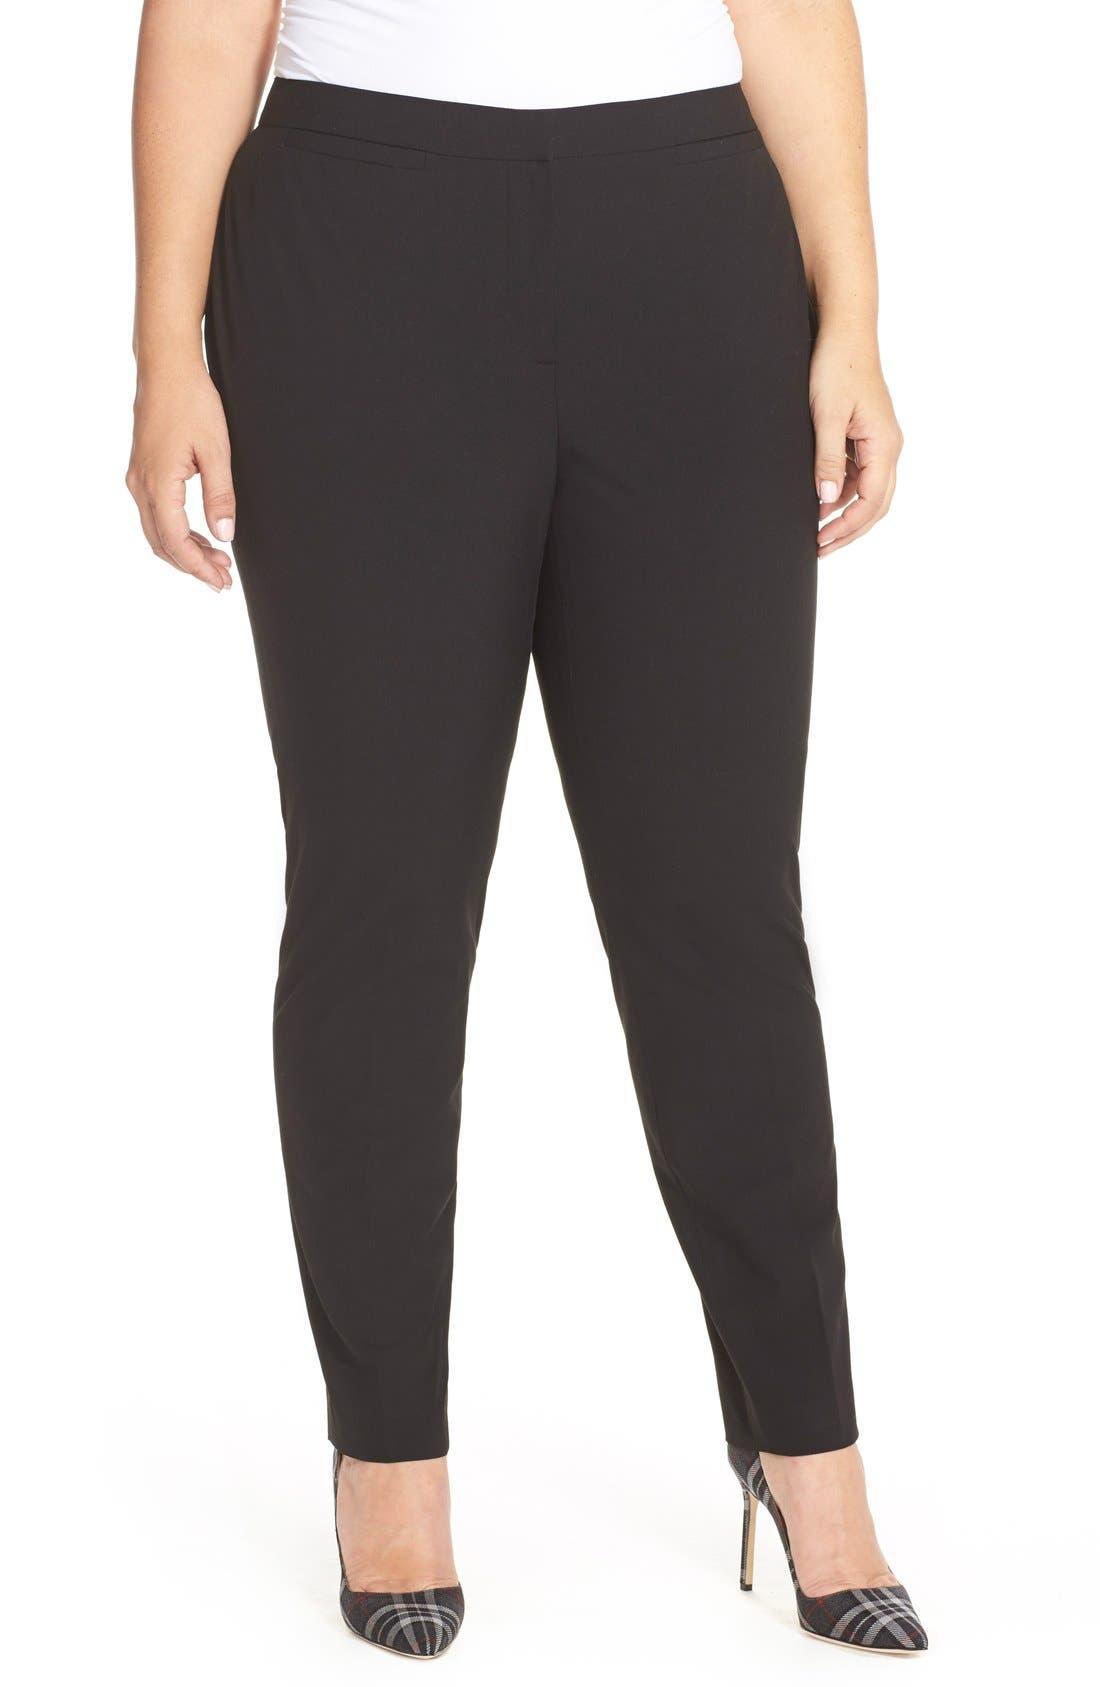 dirtyinstalzonevx6.ga S 6XL Blue Leggings Summer Autumn High Waist Elastic plus Size women Skinny jeans Femme Capris denim pants. Sold by VIRTUAL STORE USA. $ $ Style & Co. Women's Plus Size Stretch Skinny Jeans. Sold by Rennde. $ $